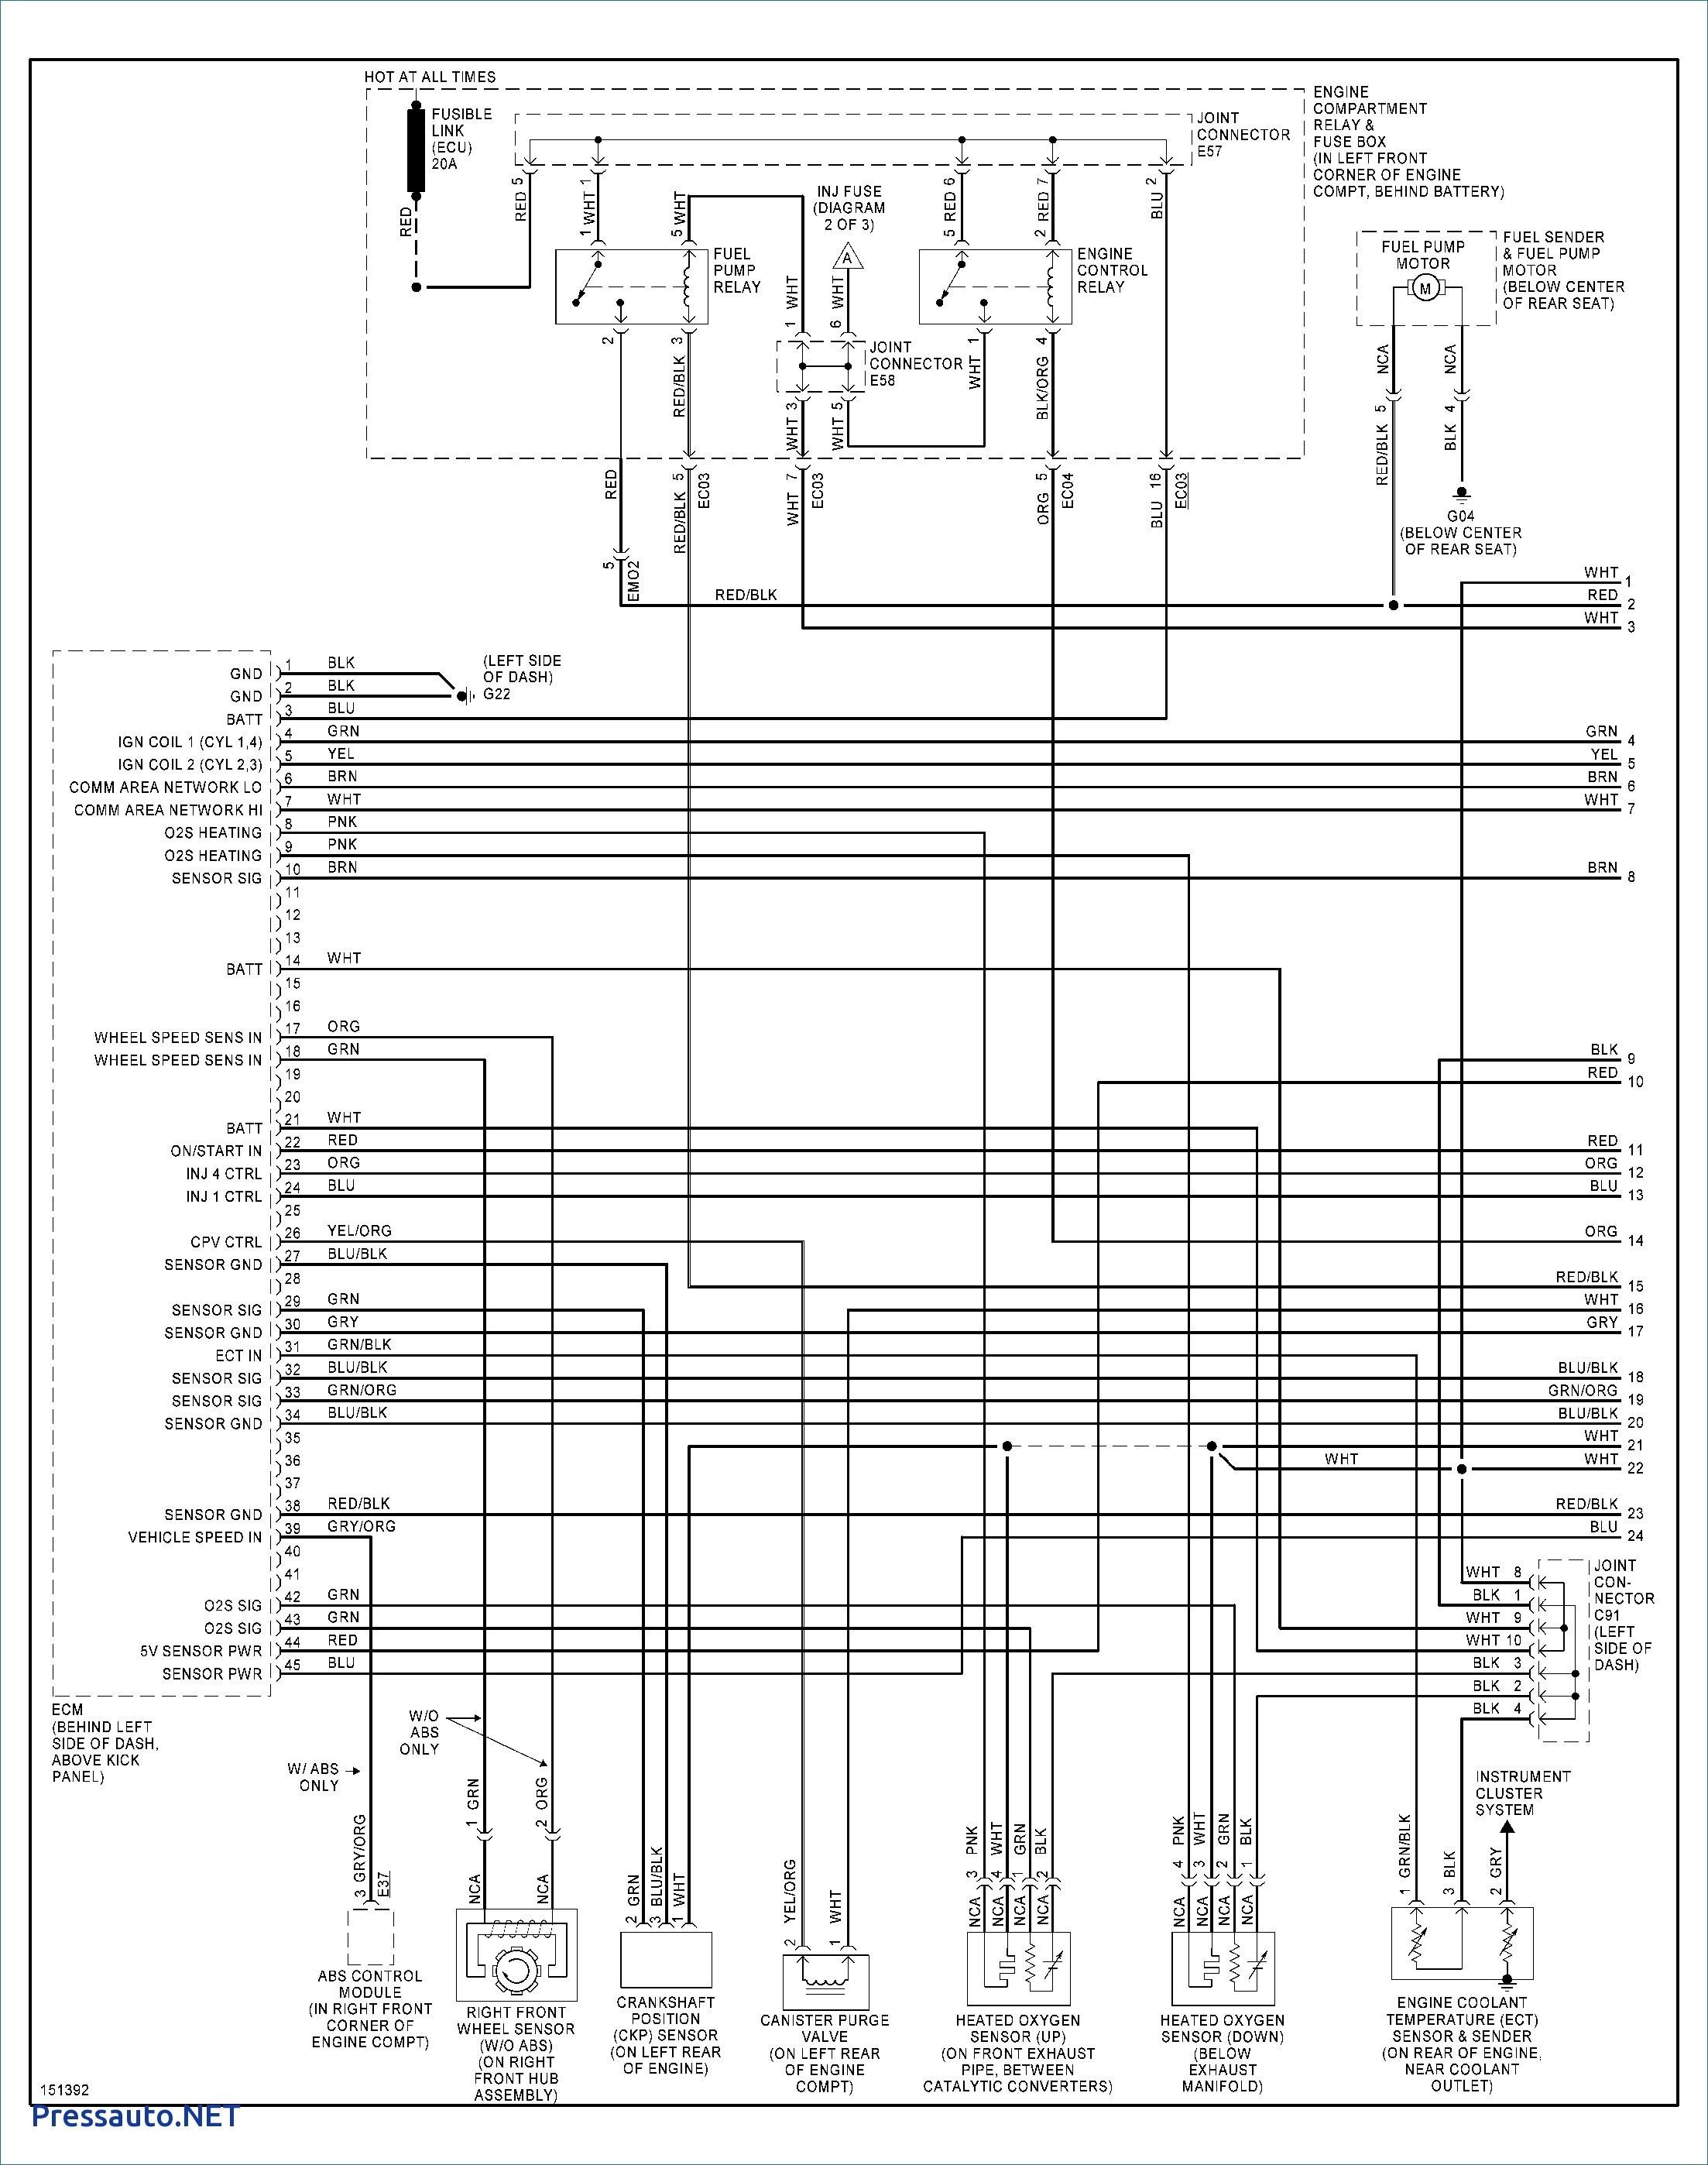 2007 Hyundai Santa Fe Engine Diagram Wiring Diagram for 2005 Hyundai Santa Fe 3 5 Schematics Wiring Of 2007 Hyundai Santa Fe Engine Diagram